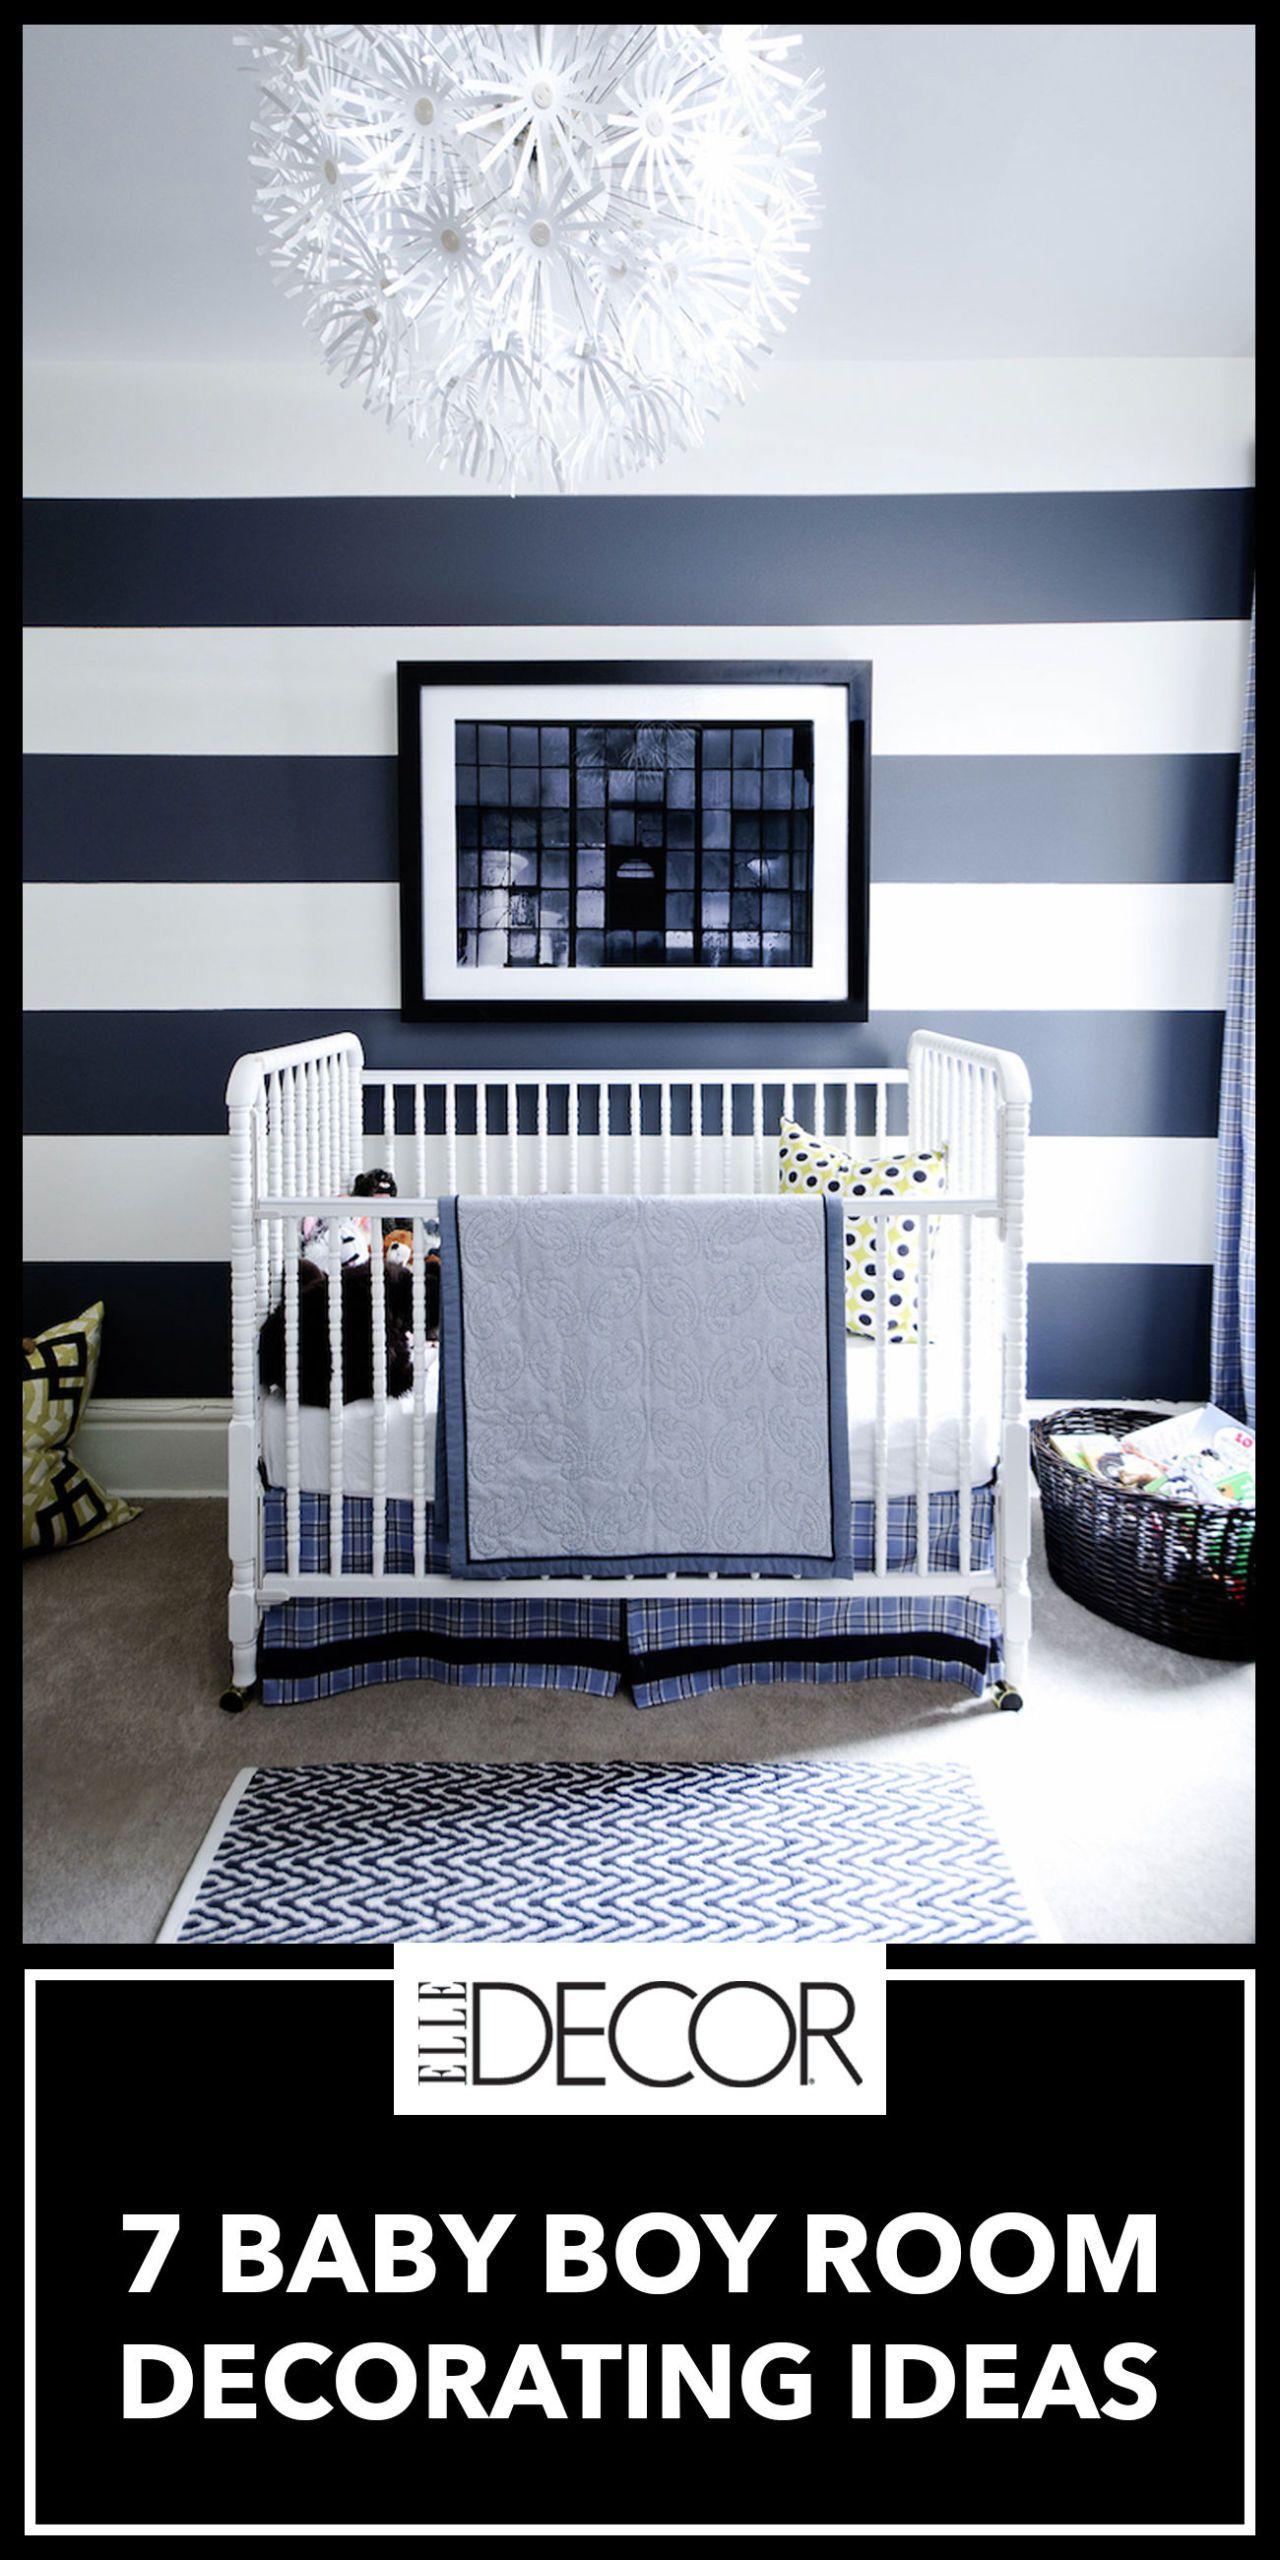 Image. Megan Tatem. Follow ELLE DECOR On Pinterest For More Baby Boy Room  ...